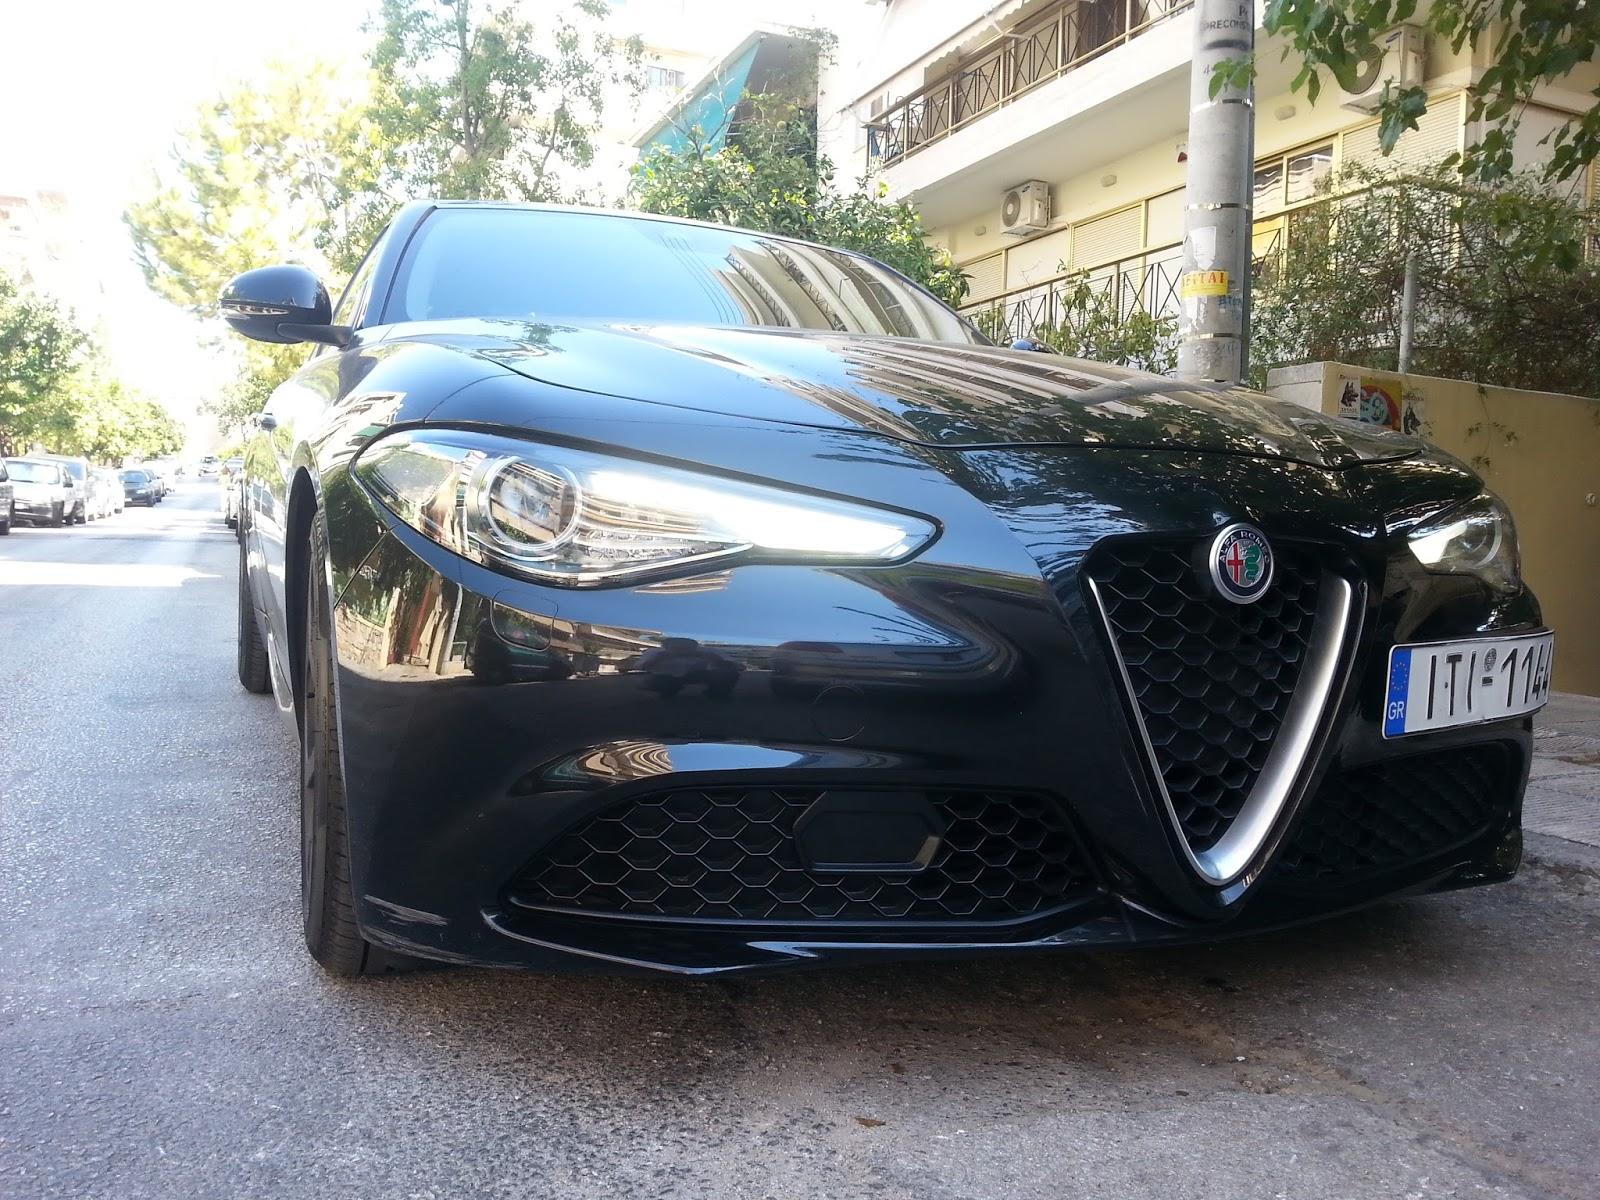 a3 1 Είναι η Alfa Romeo Giulia τόσο καλή όσο λένε; Alfa, alfa romeo, Alfa Romeo Giulia, TEST, ΔΟΚΙΜΕΣ, οδηγούμε